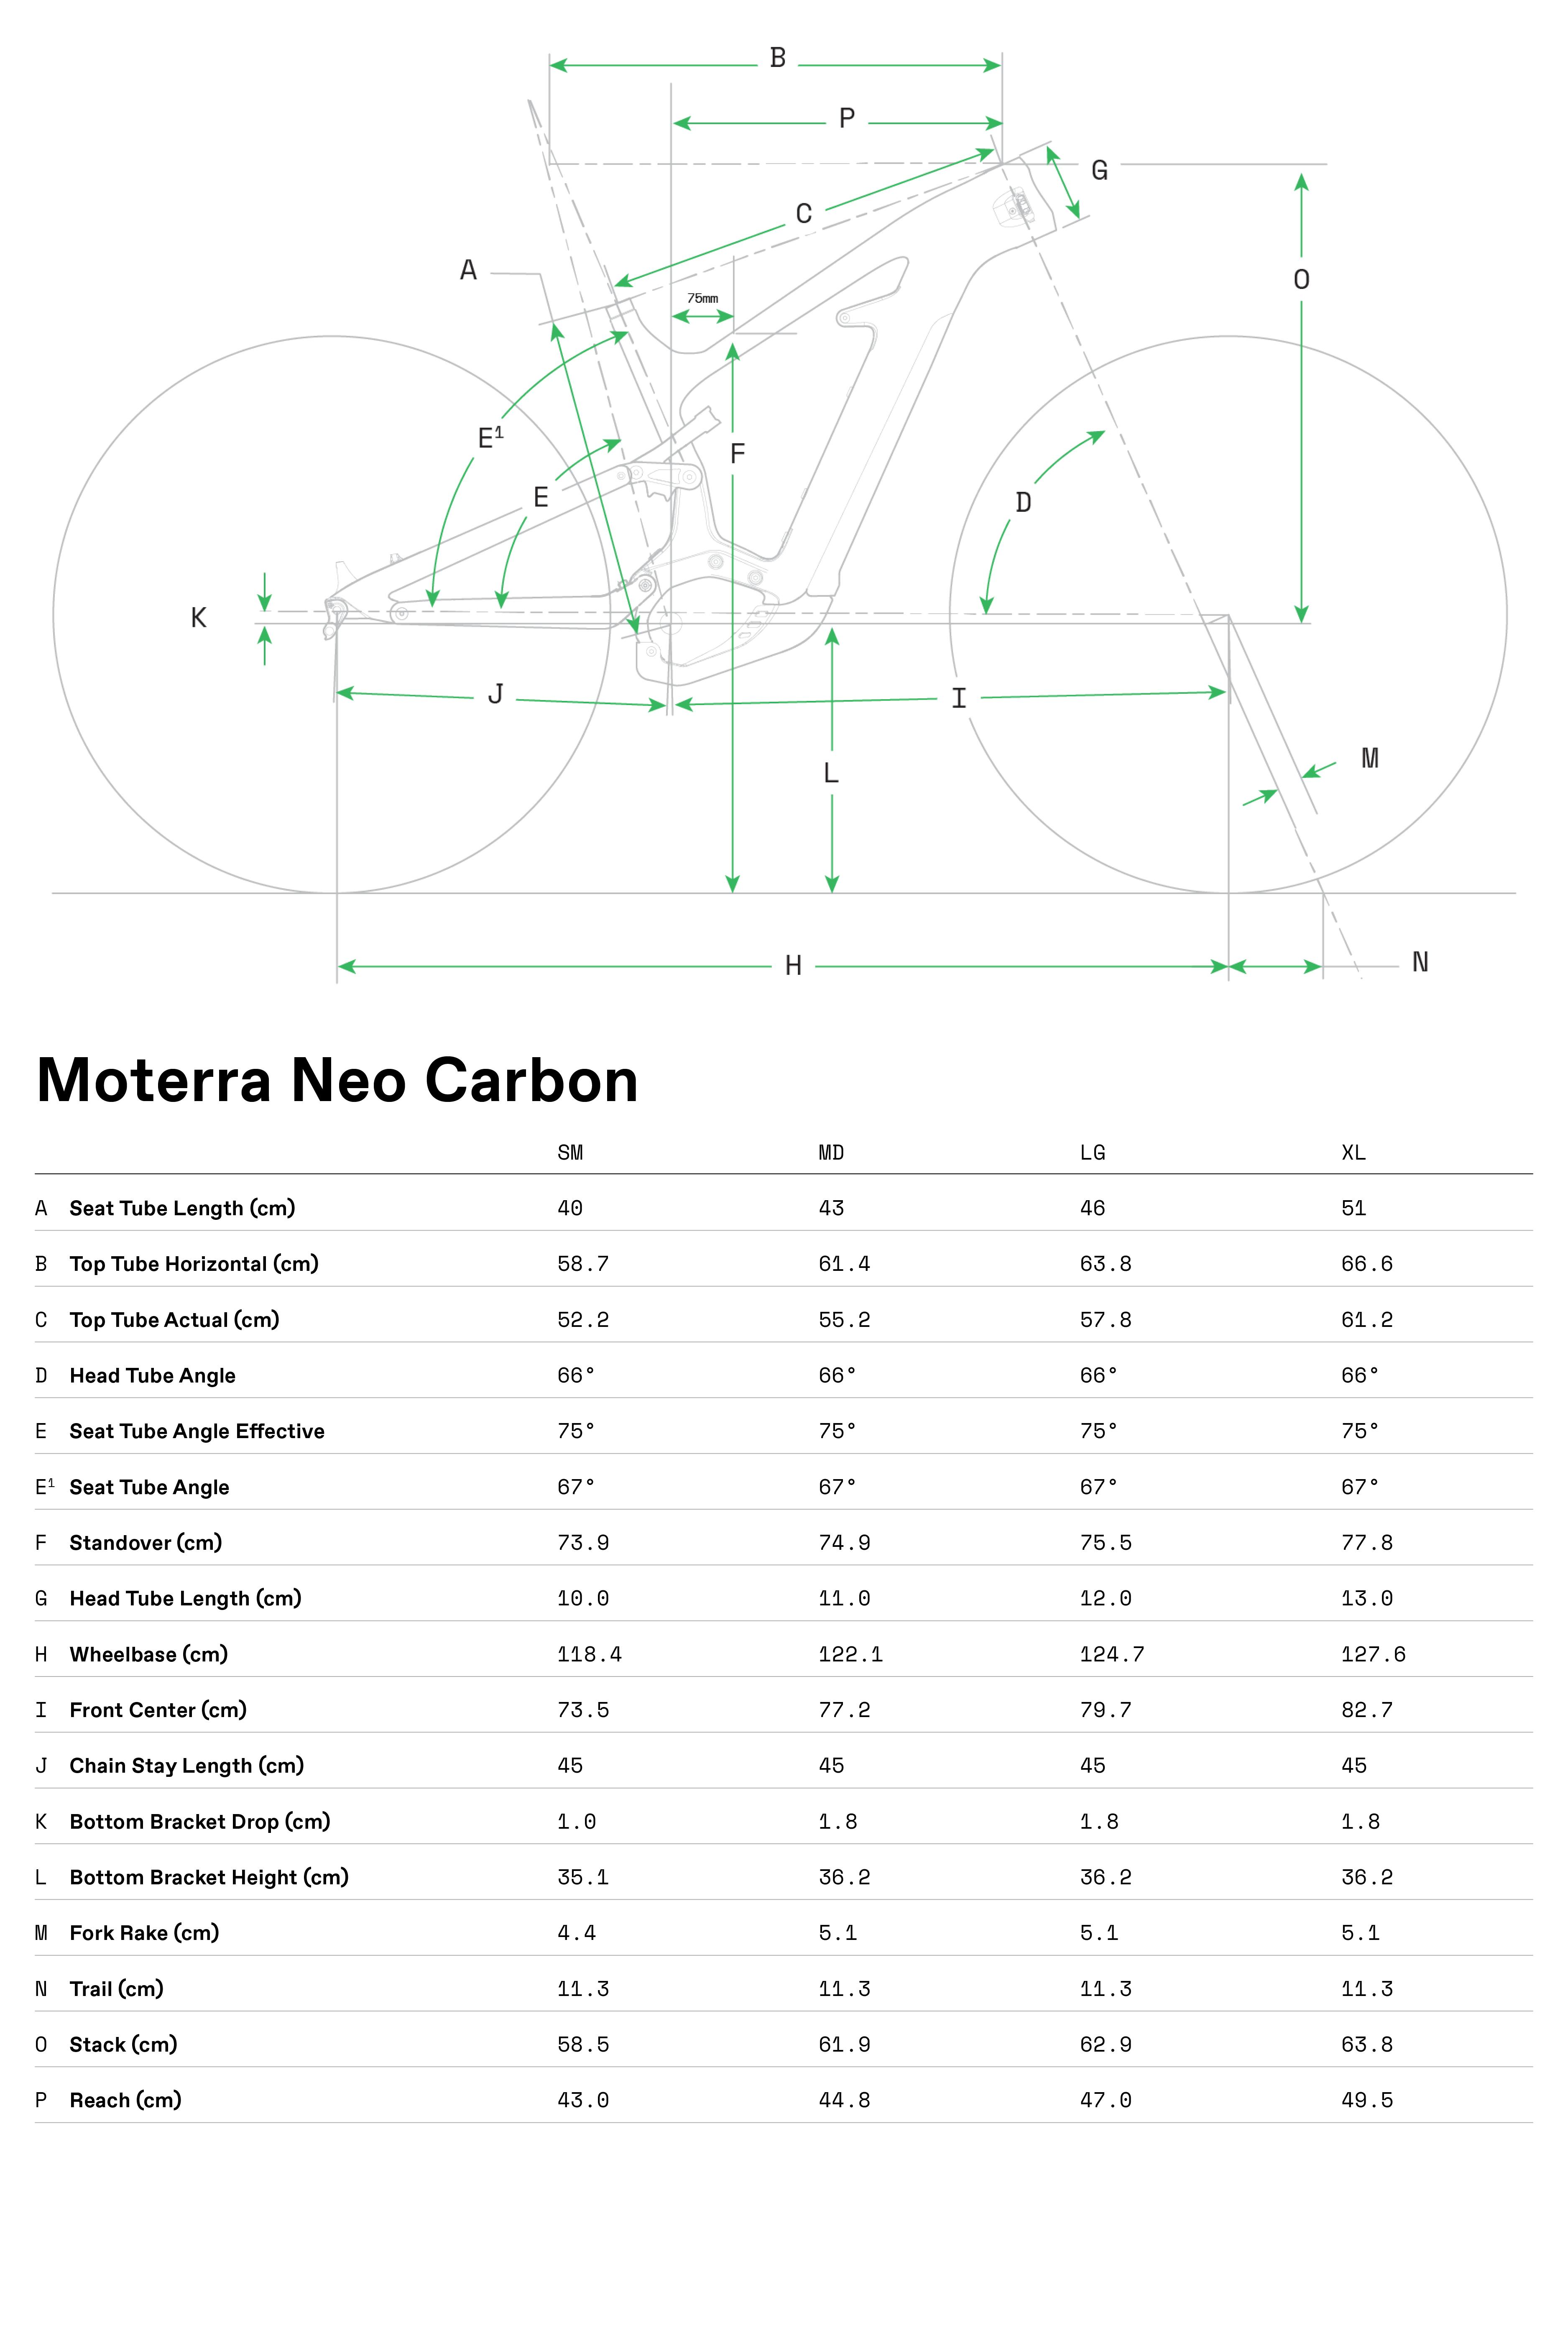 Moterra Neo Carbon